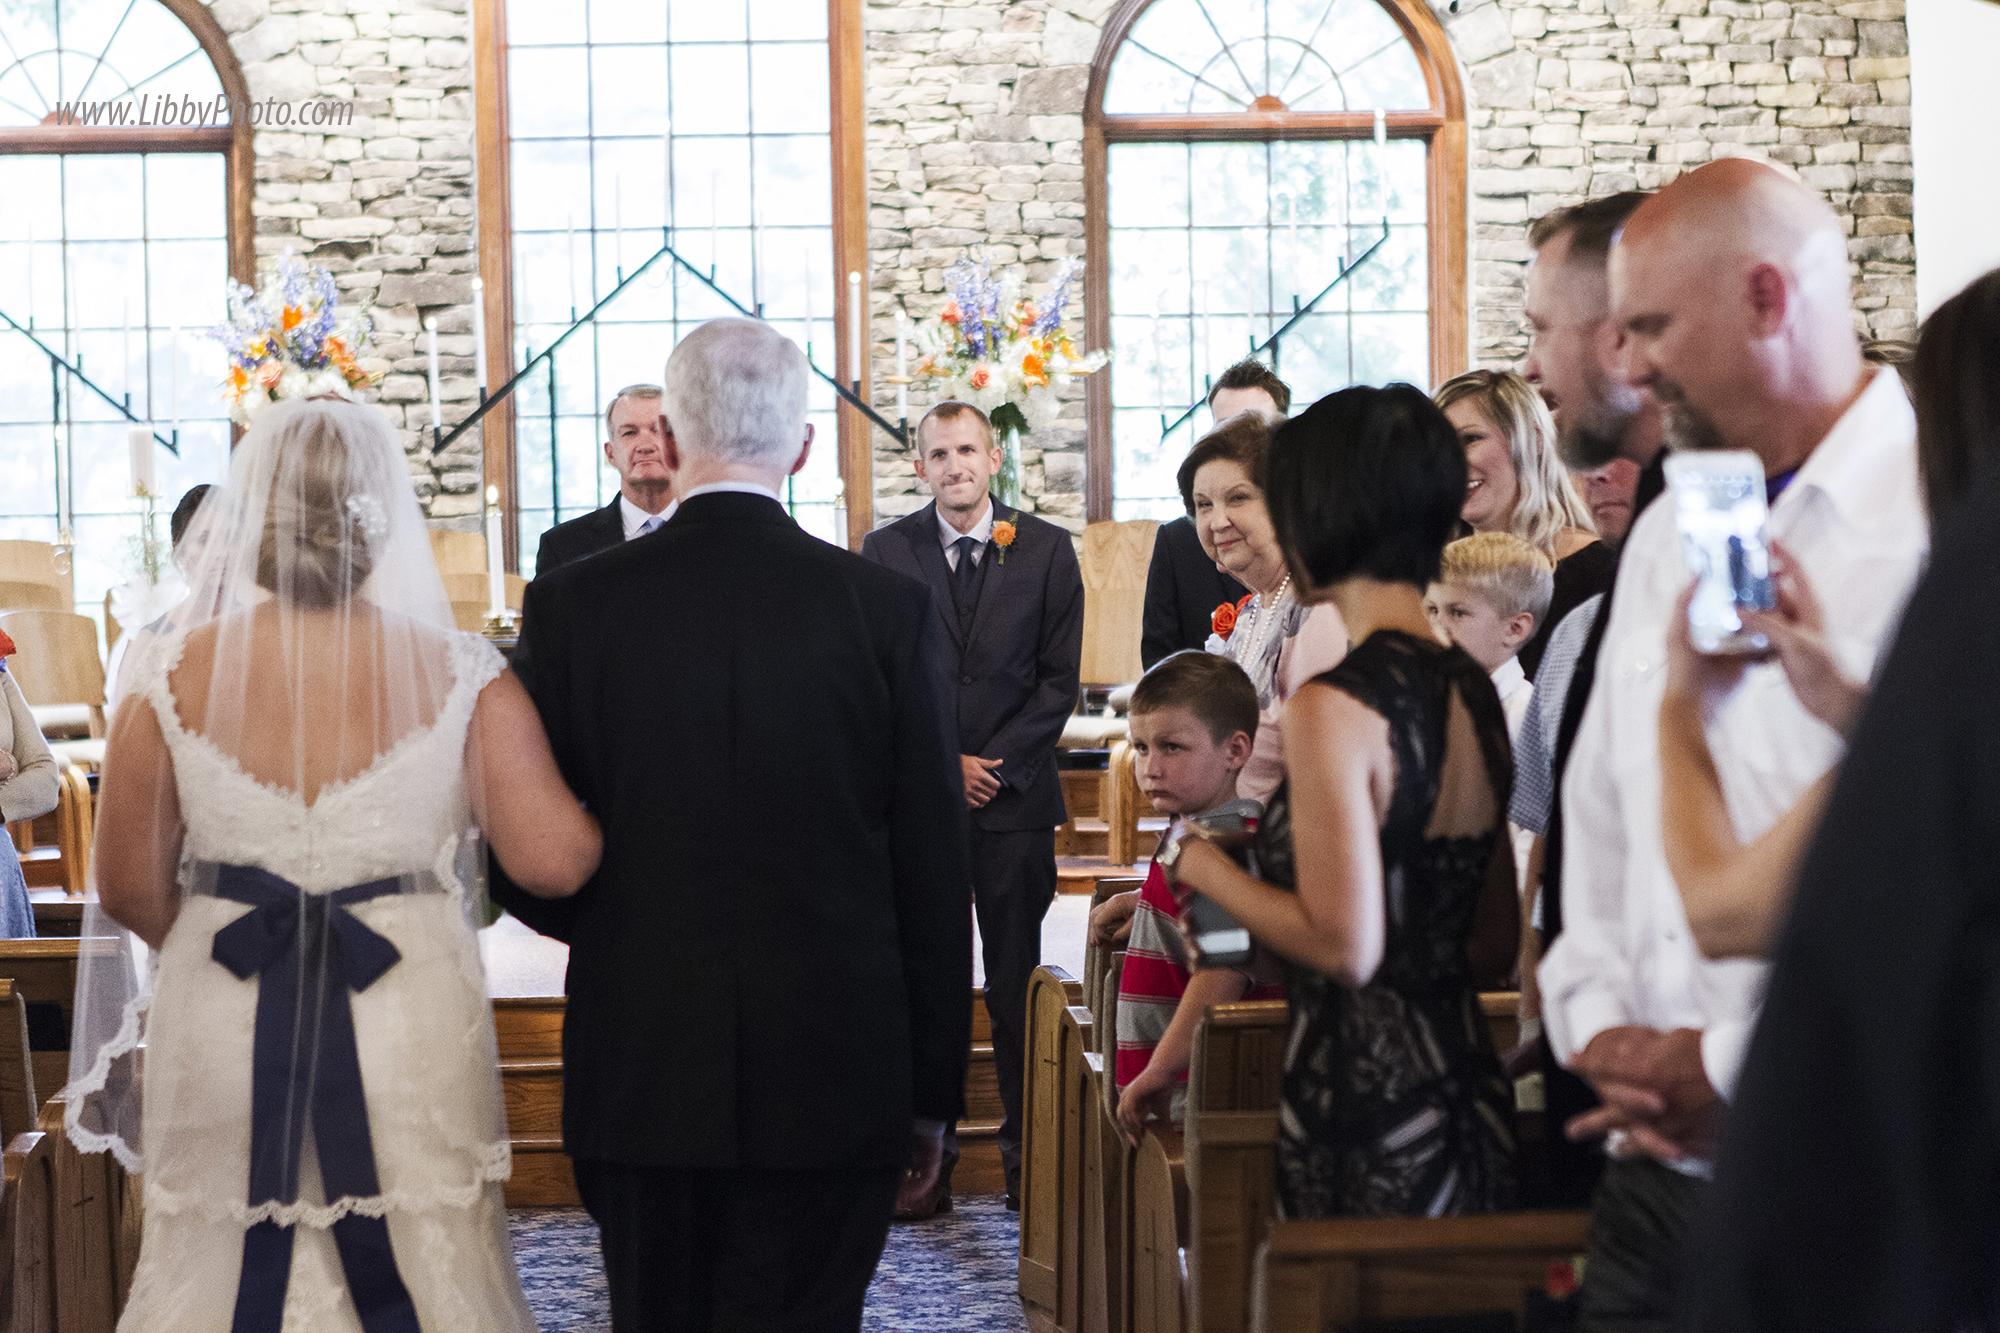 Atlanta wedding photography, Libbyphoto11 (6).jpg